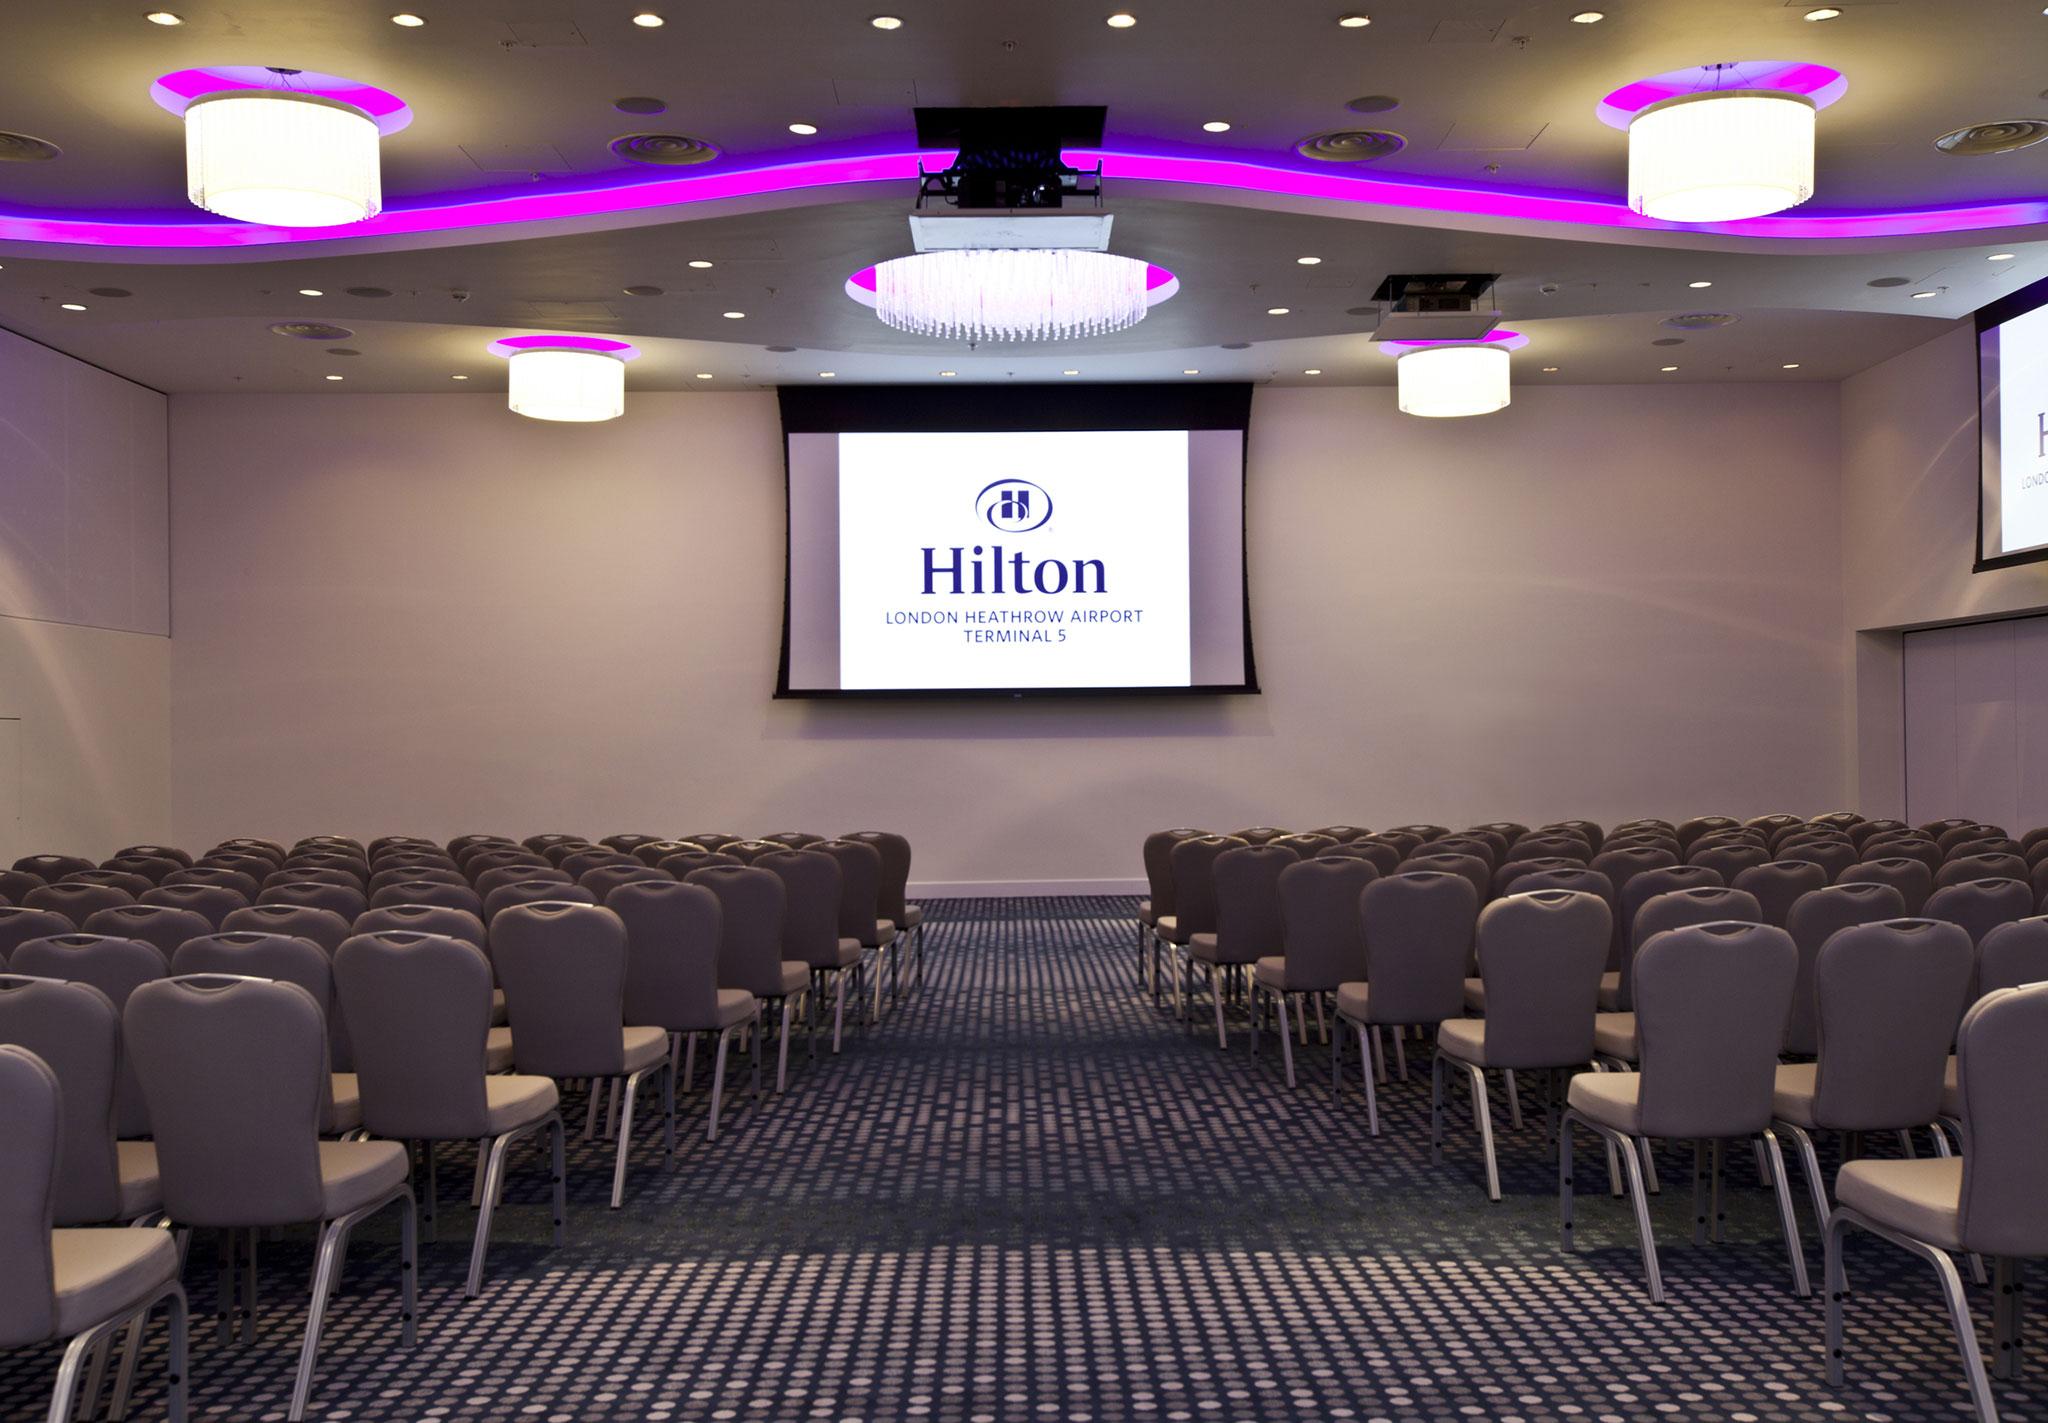 Hilton London Heathrow Airport Terminal 5 - Flughafenhotel